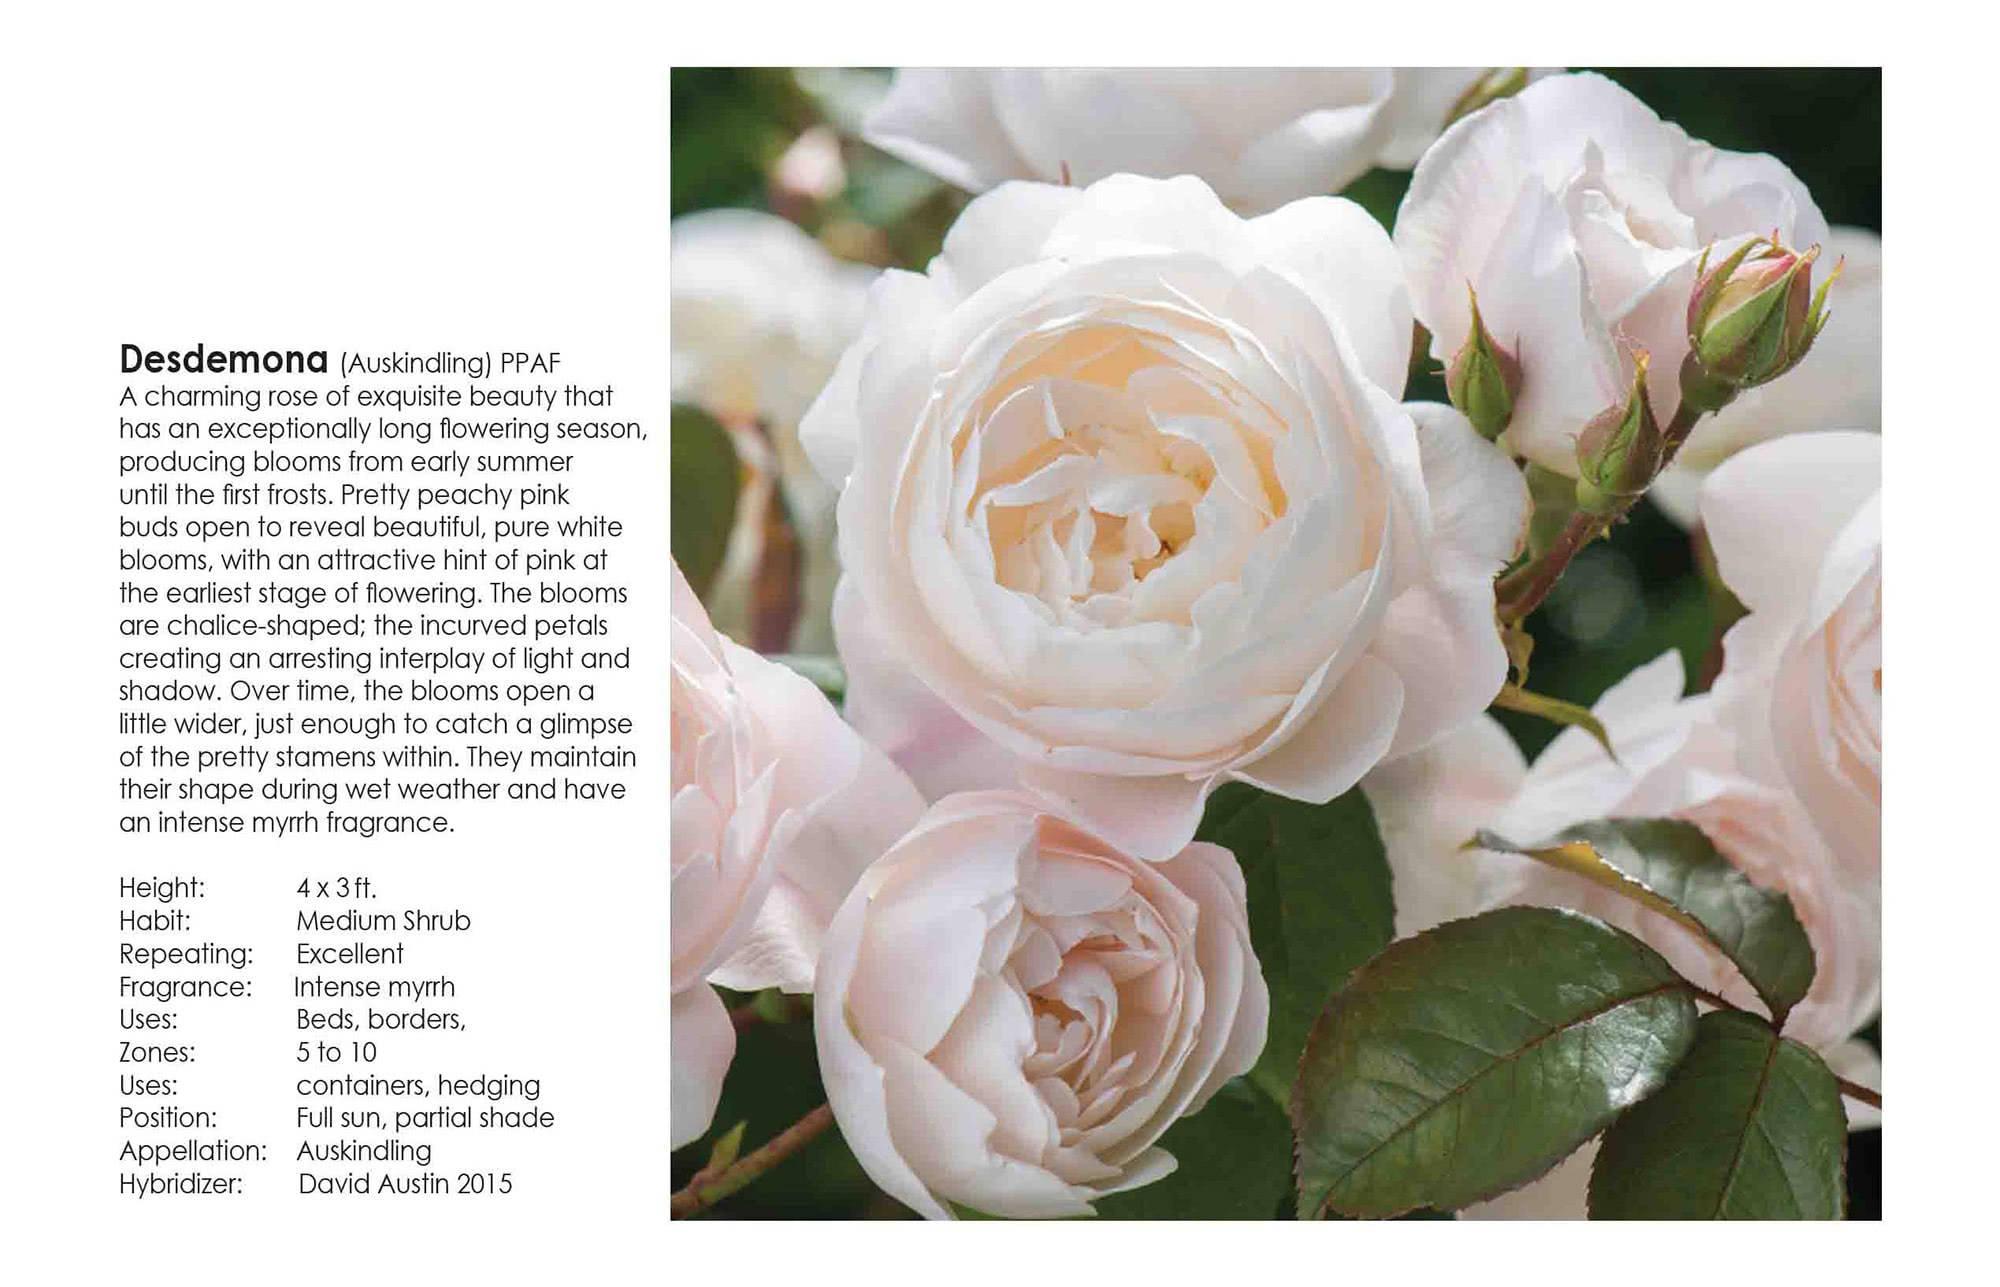 David Austin Roses - Desdemona